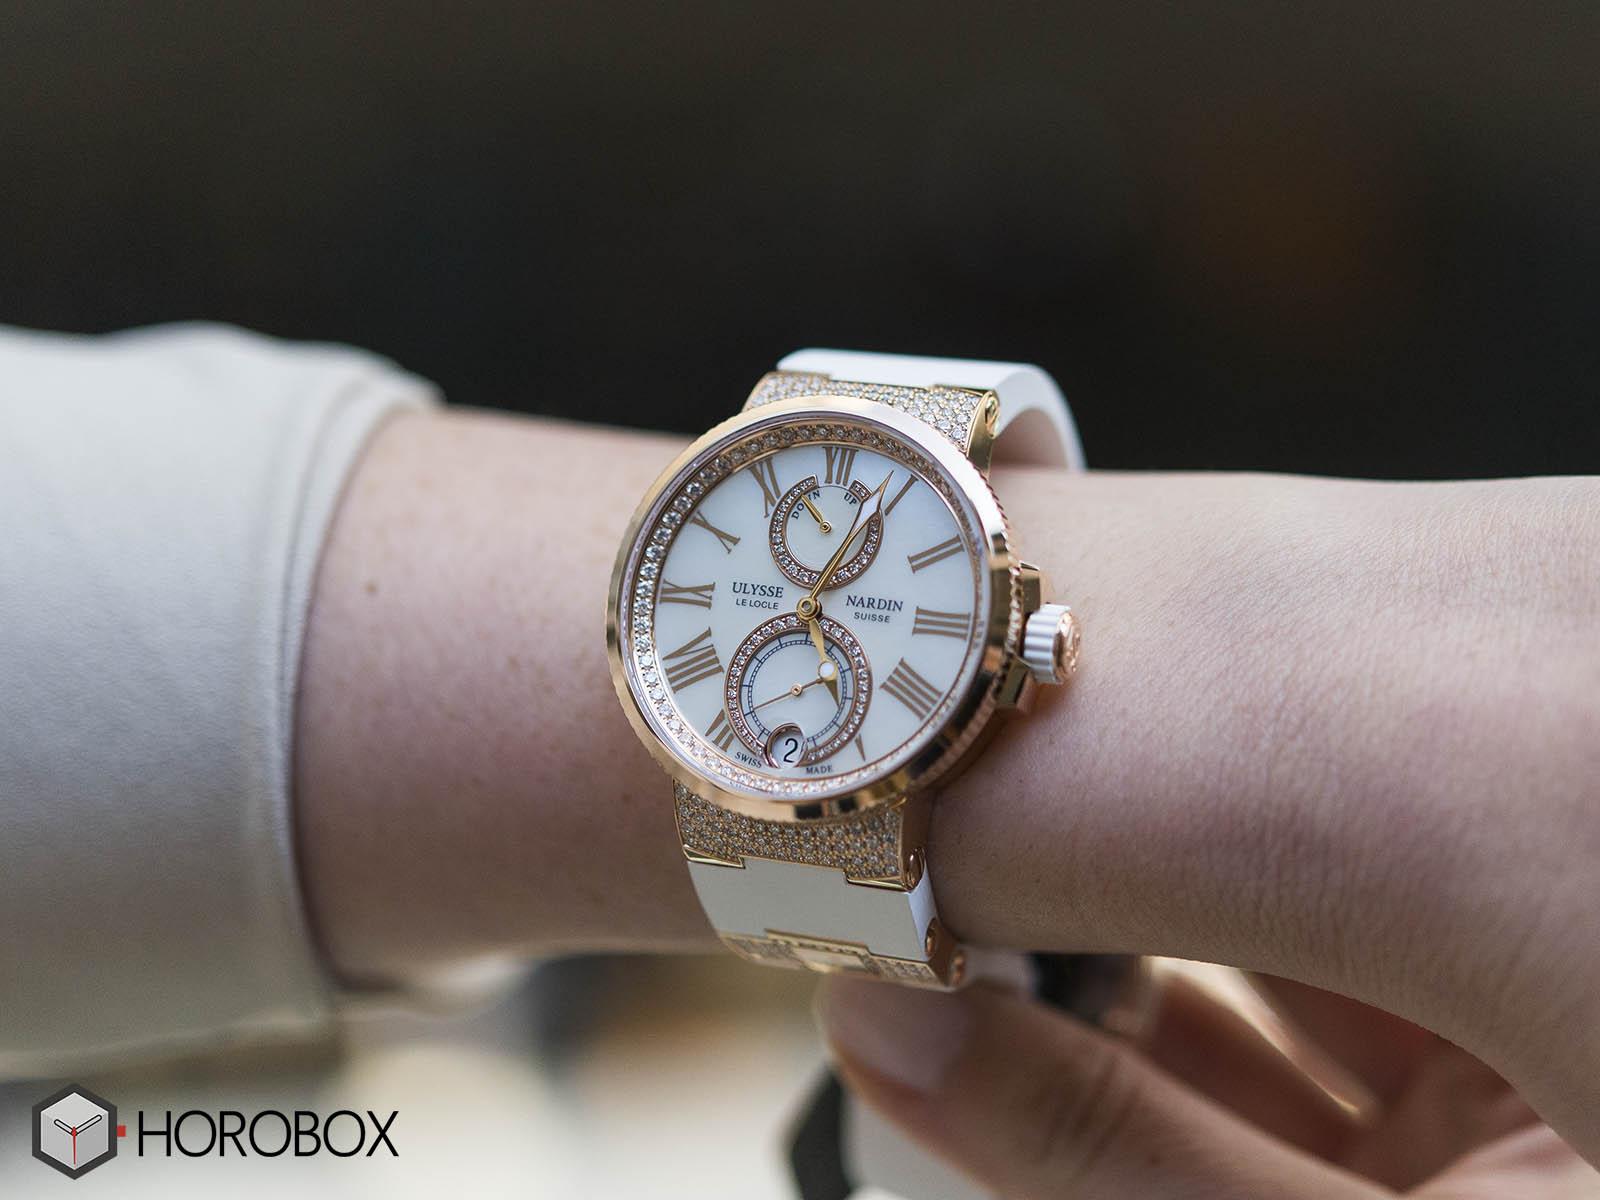 ulysse-nardin-lady-marine-chronometer-3.jpg